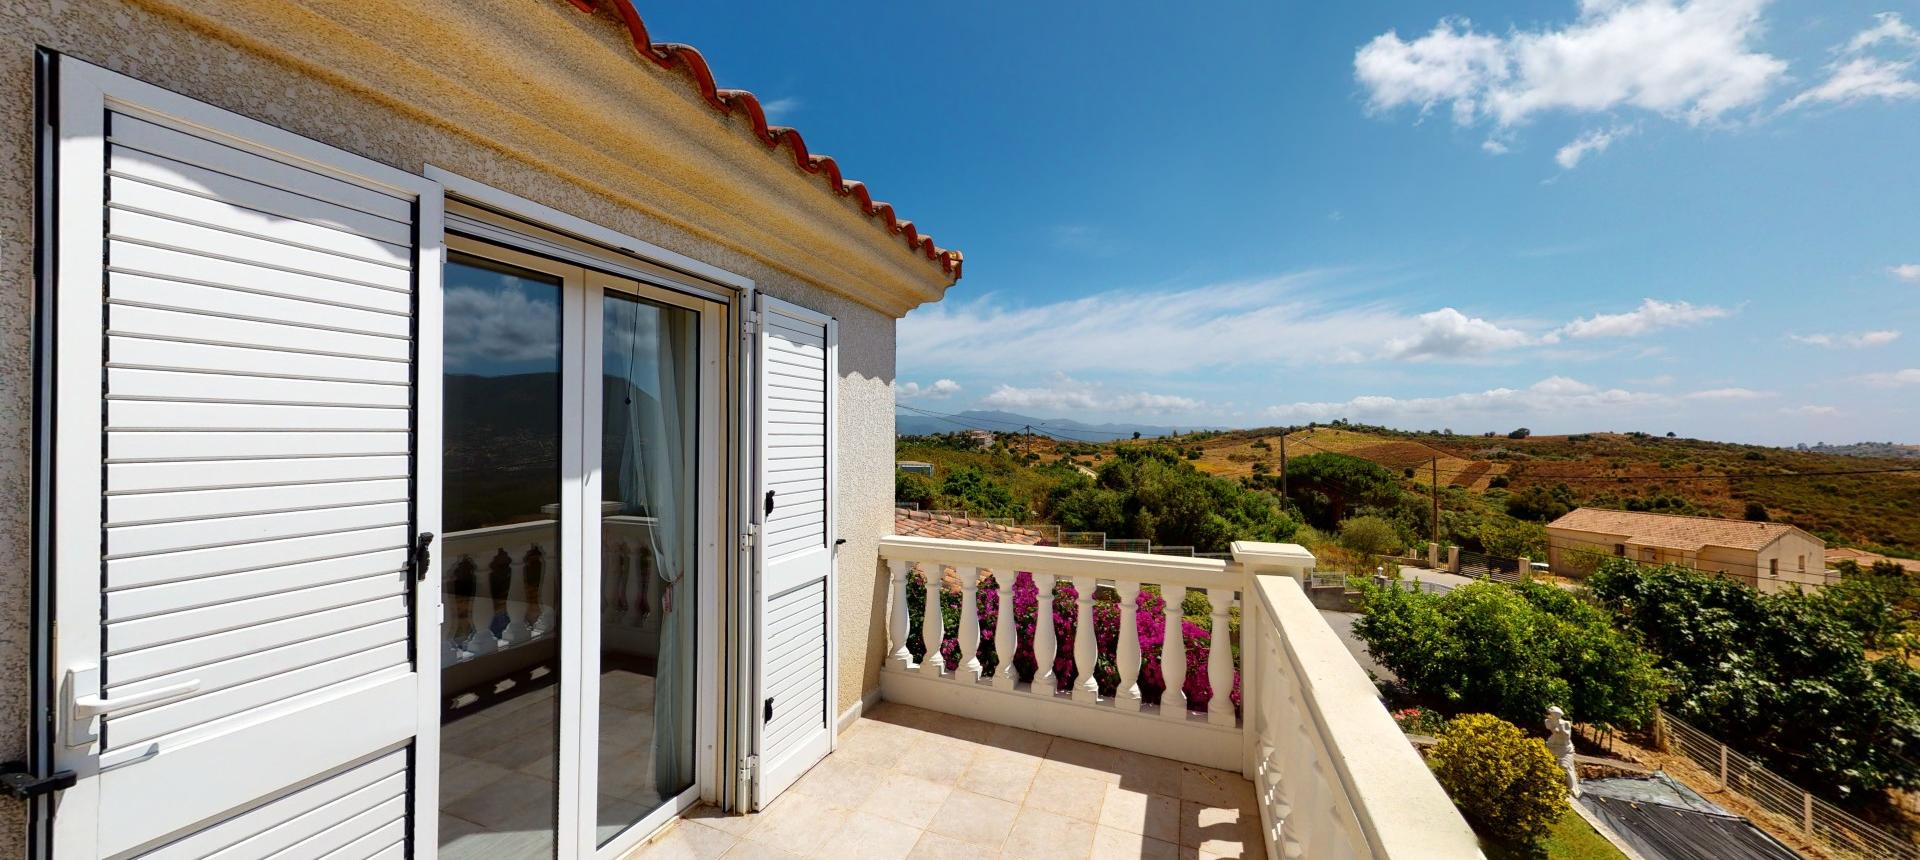 A vendre villa avec vue dégagée proche Ajaccio - AFA - TERRASSE R+1